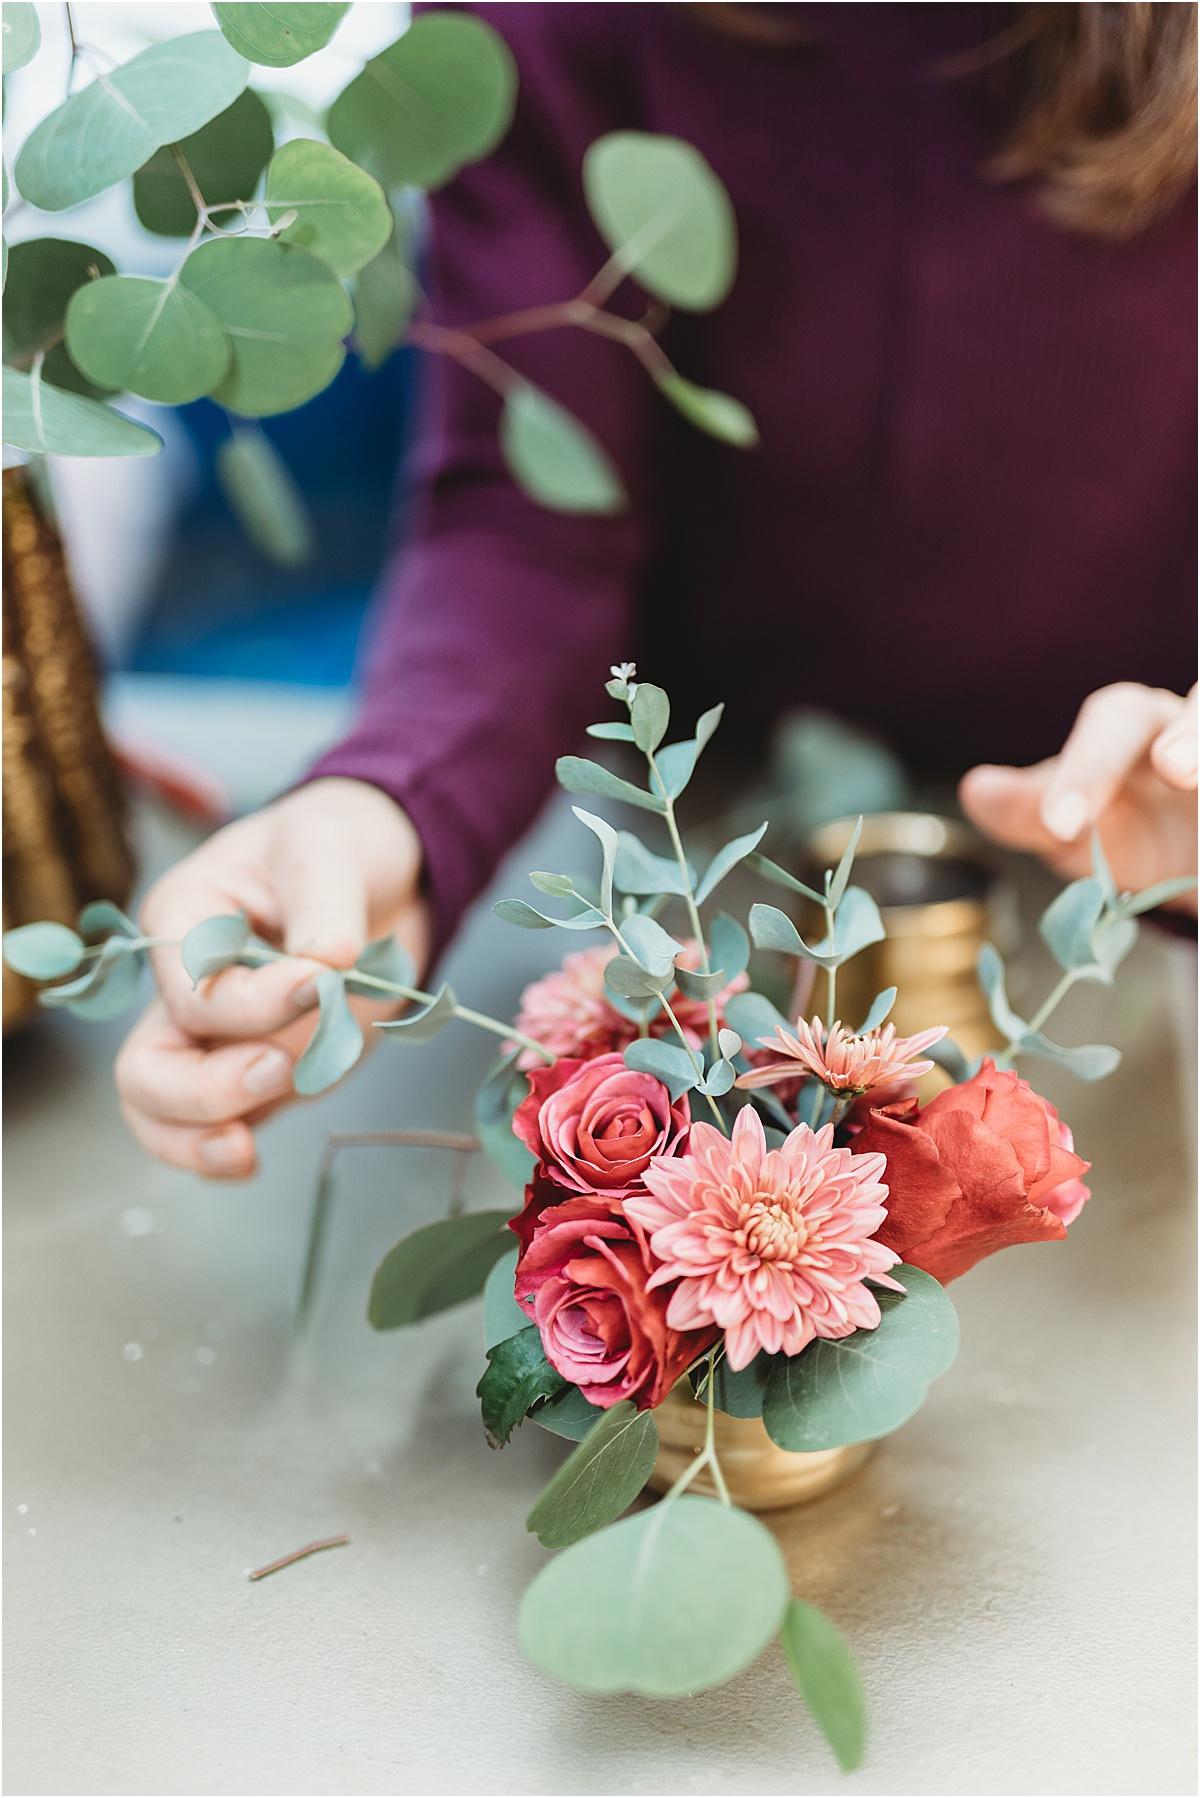 Songbird Floristry